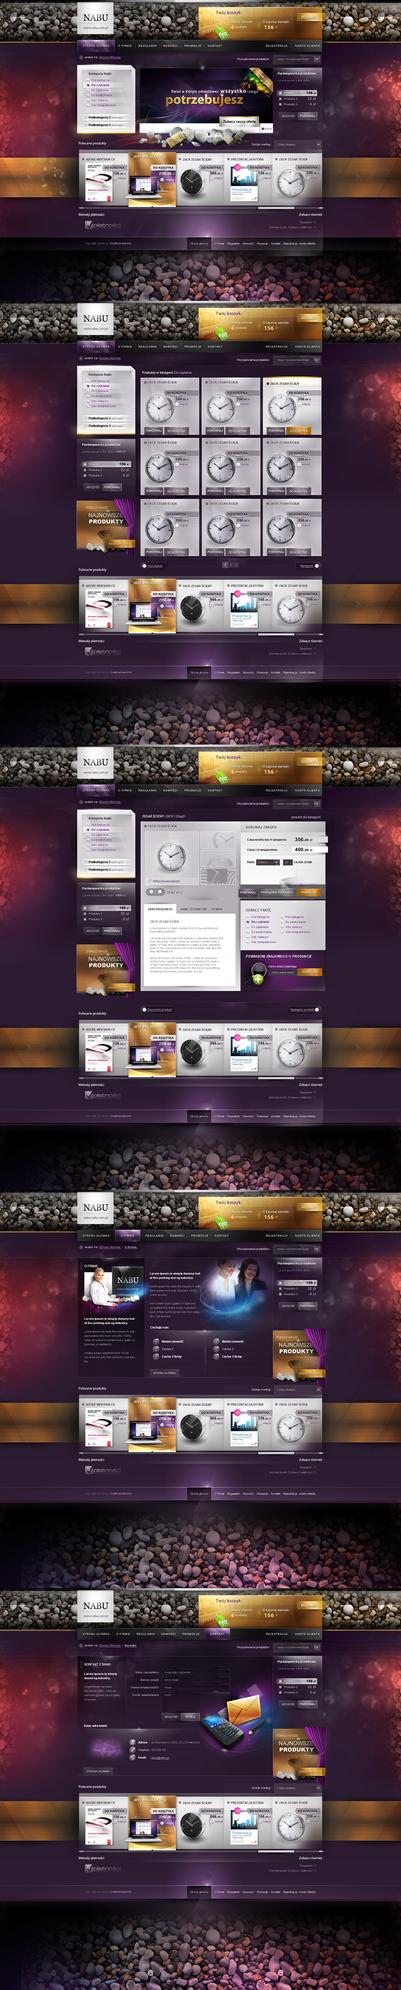 Nabu shop by webdesigner1921